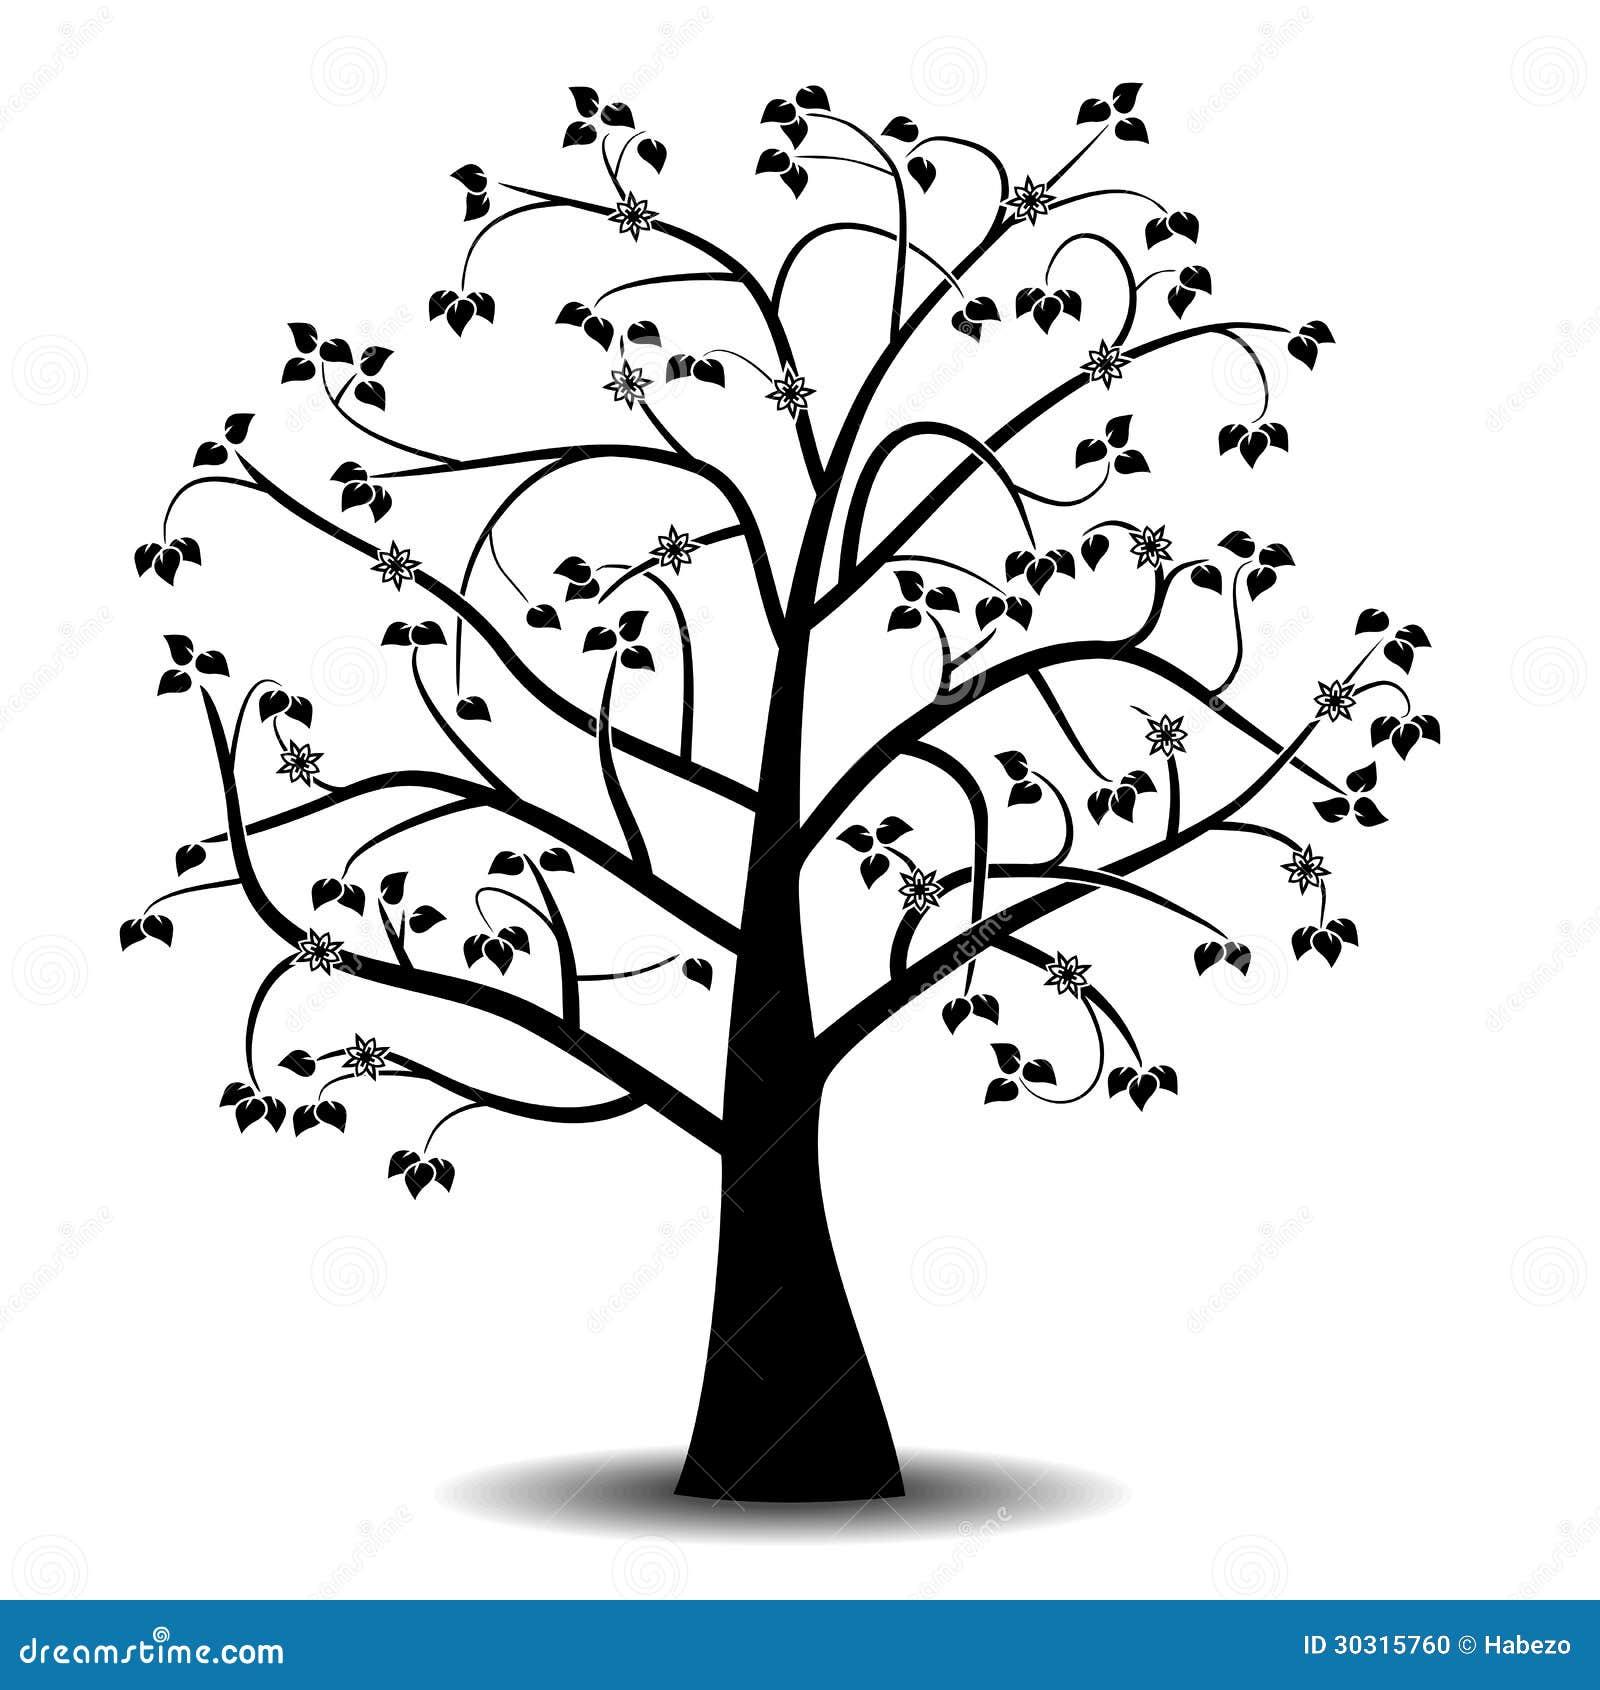 Art Tree Black Silhouette Stock Photo Image 30315760